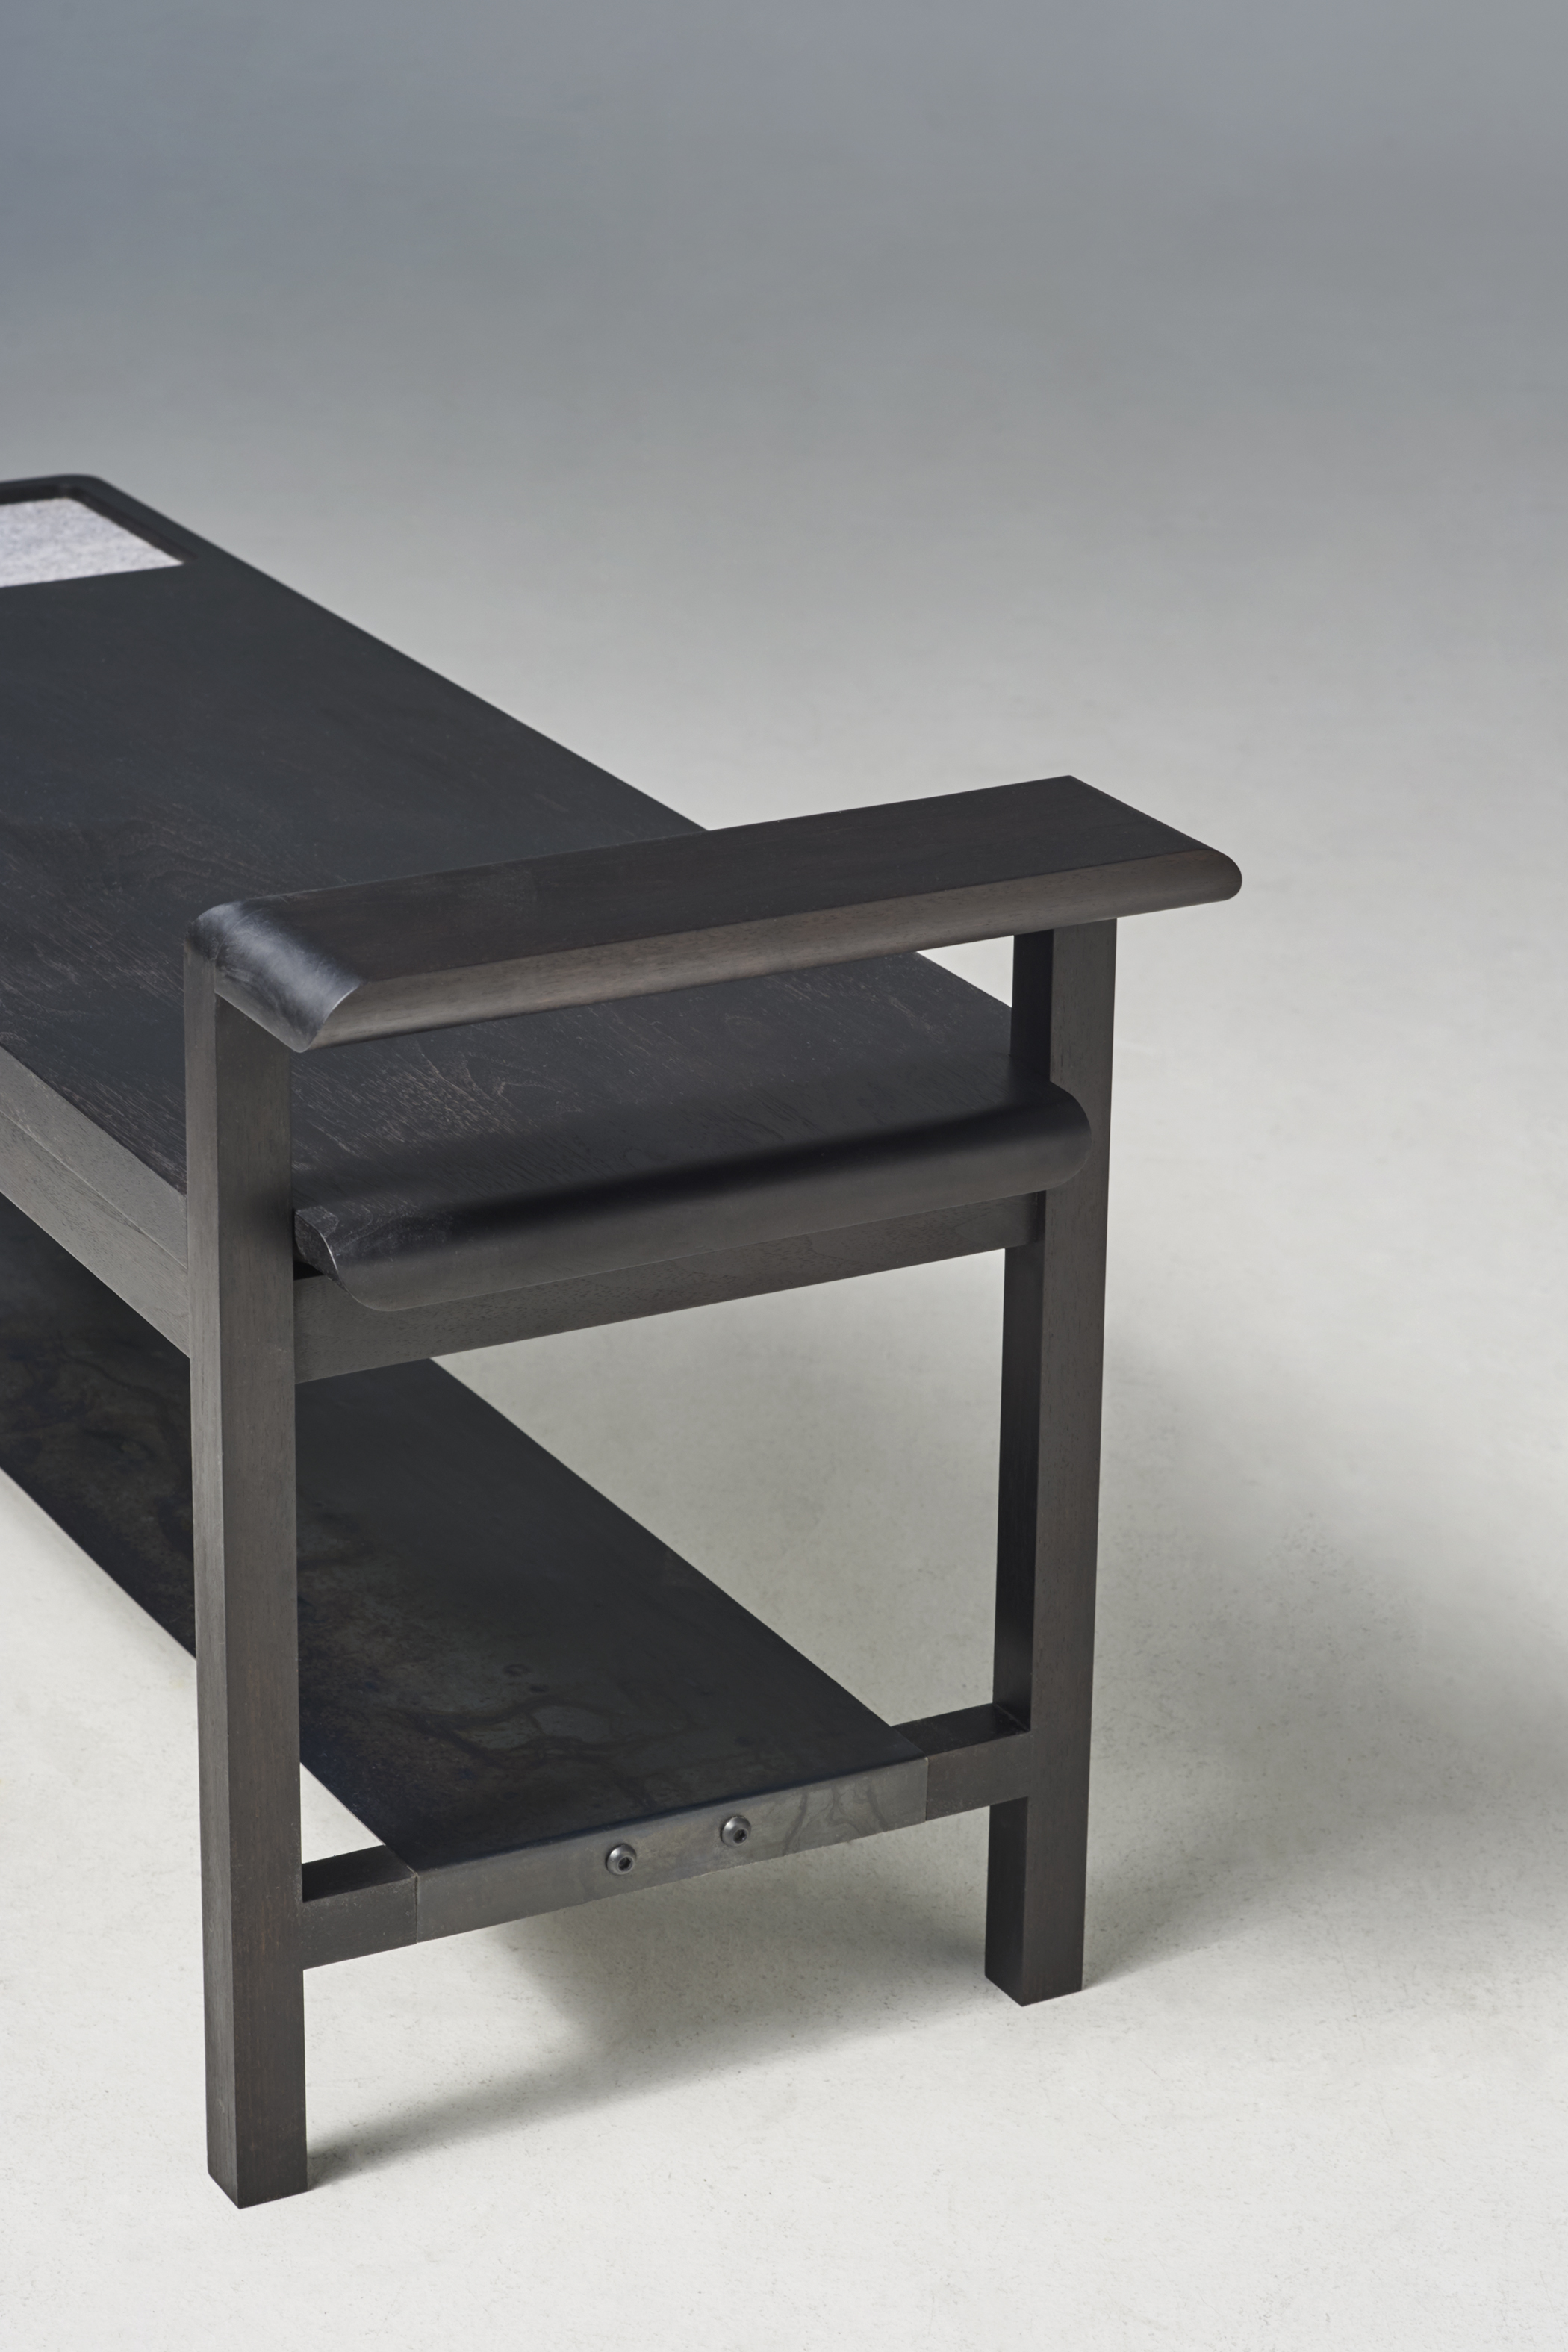 anatra bench 1.jpg